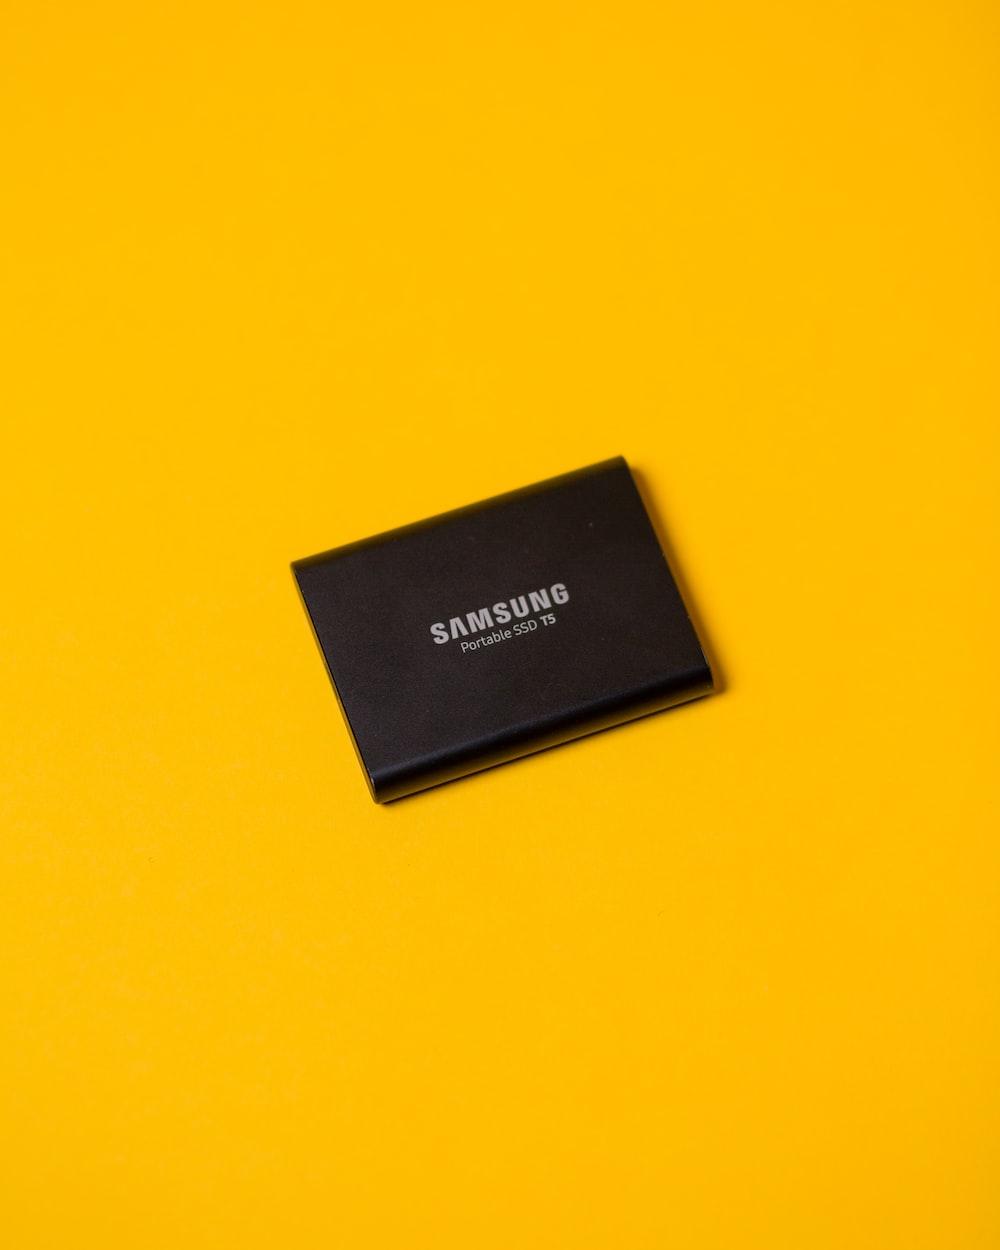 black box on yellow surface